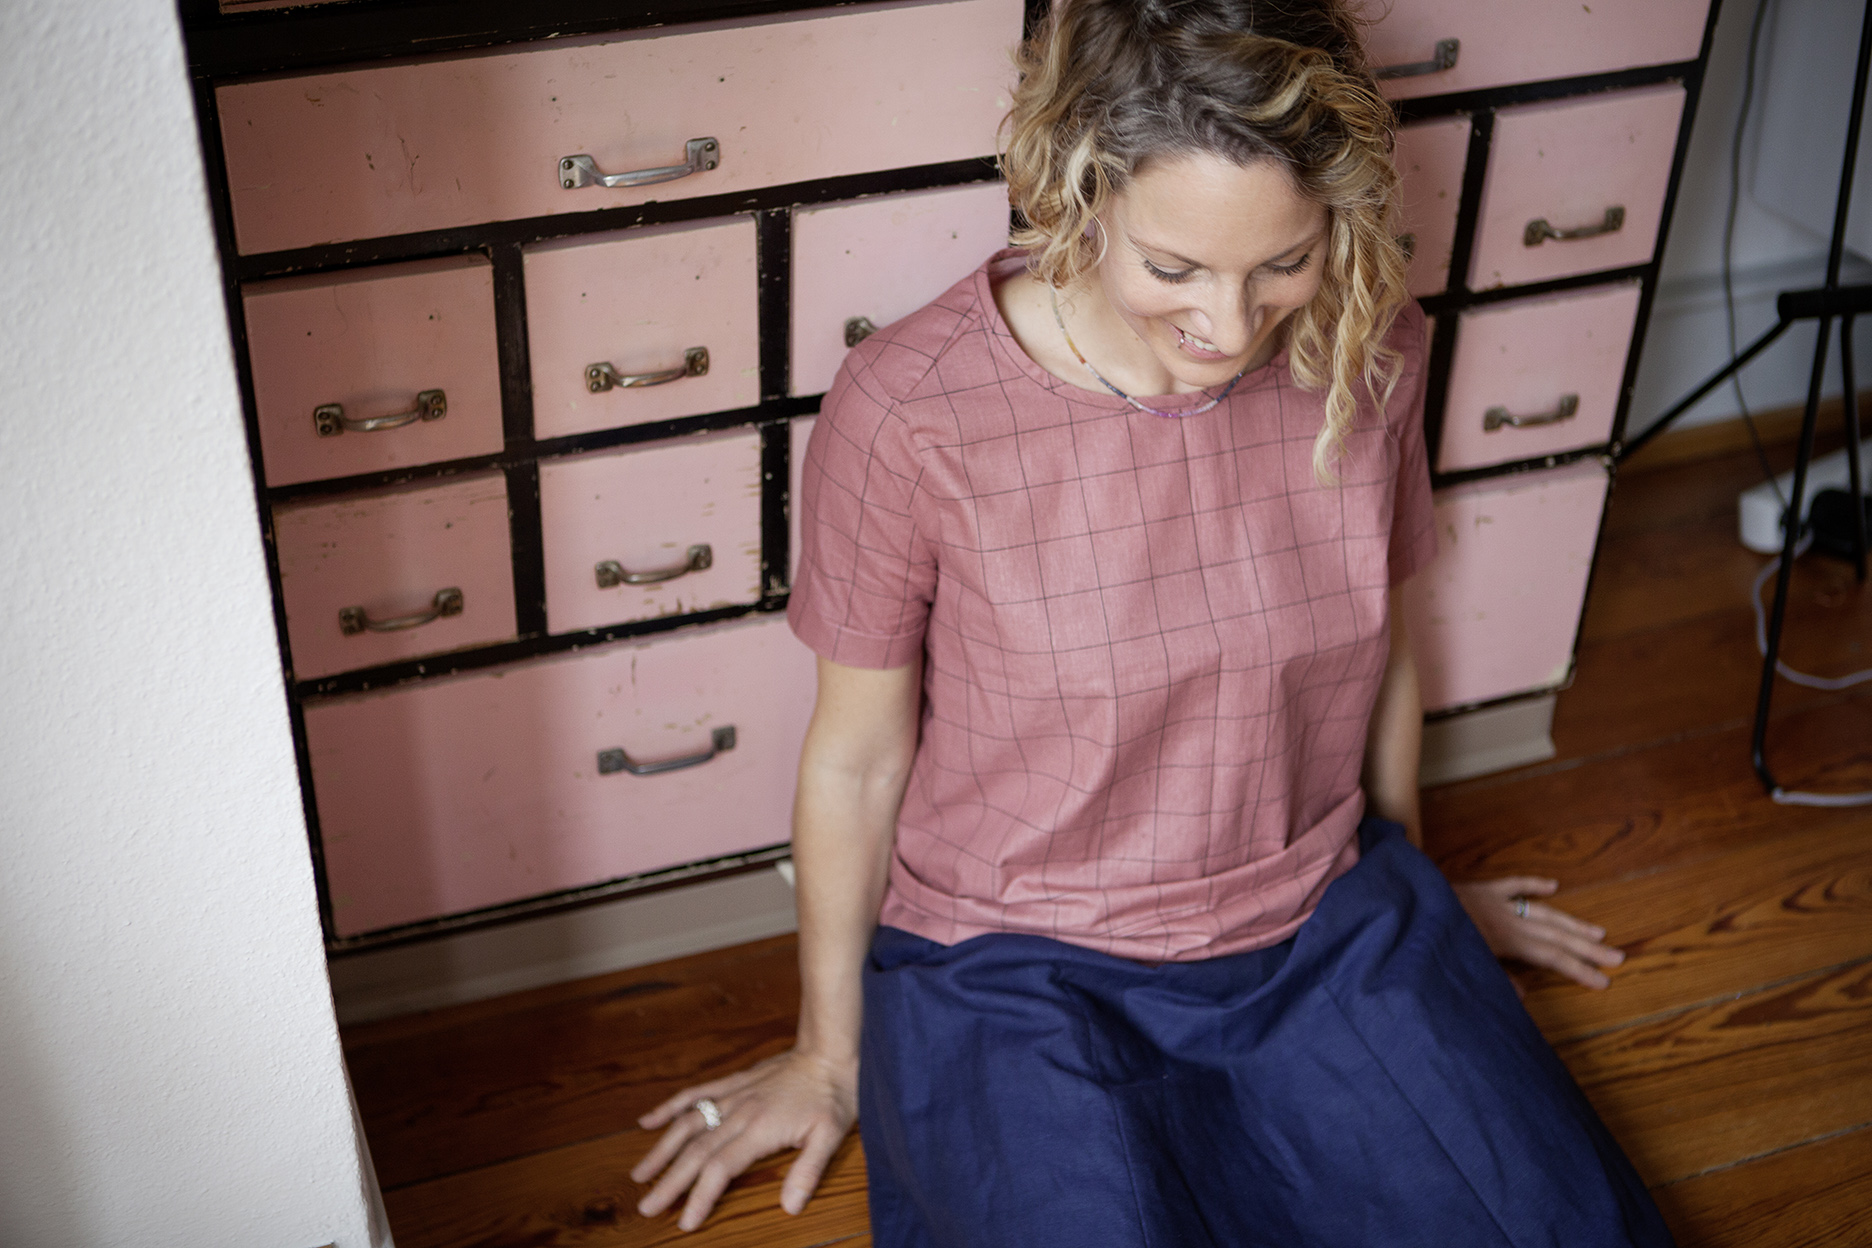 Bluse Ronja  Rock Hélène  Ring und Kette von  Ruthgold